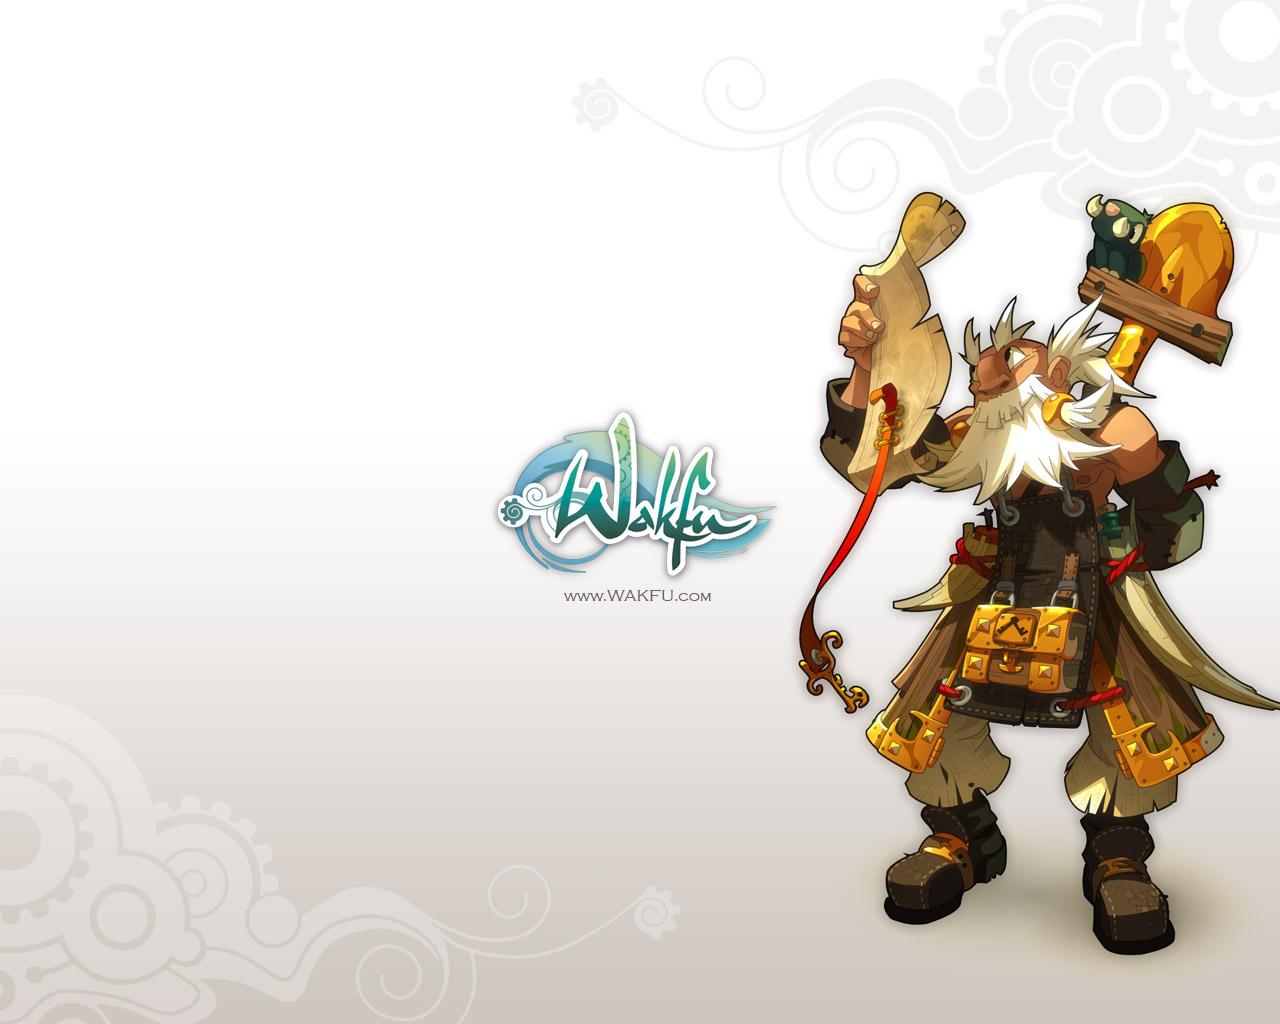 Wakfu Anime Character Design : Images about wakfu on pinterest deviantart art